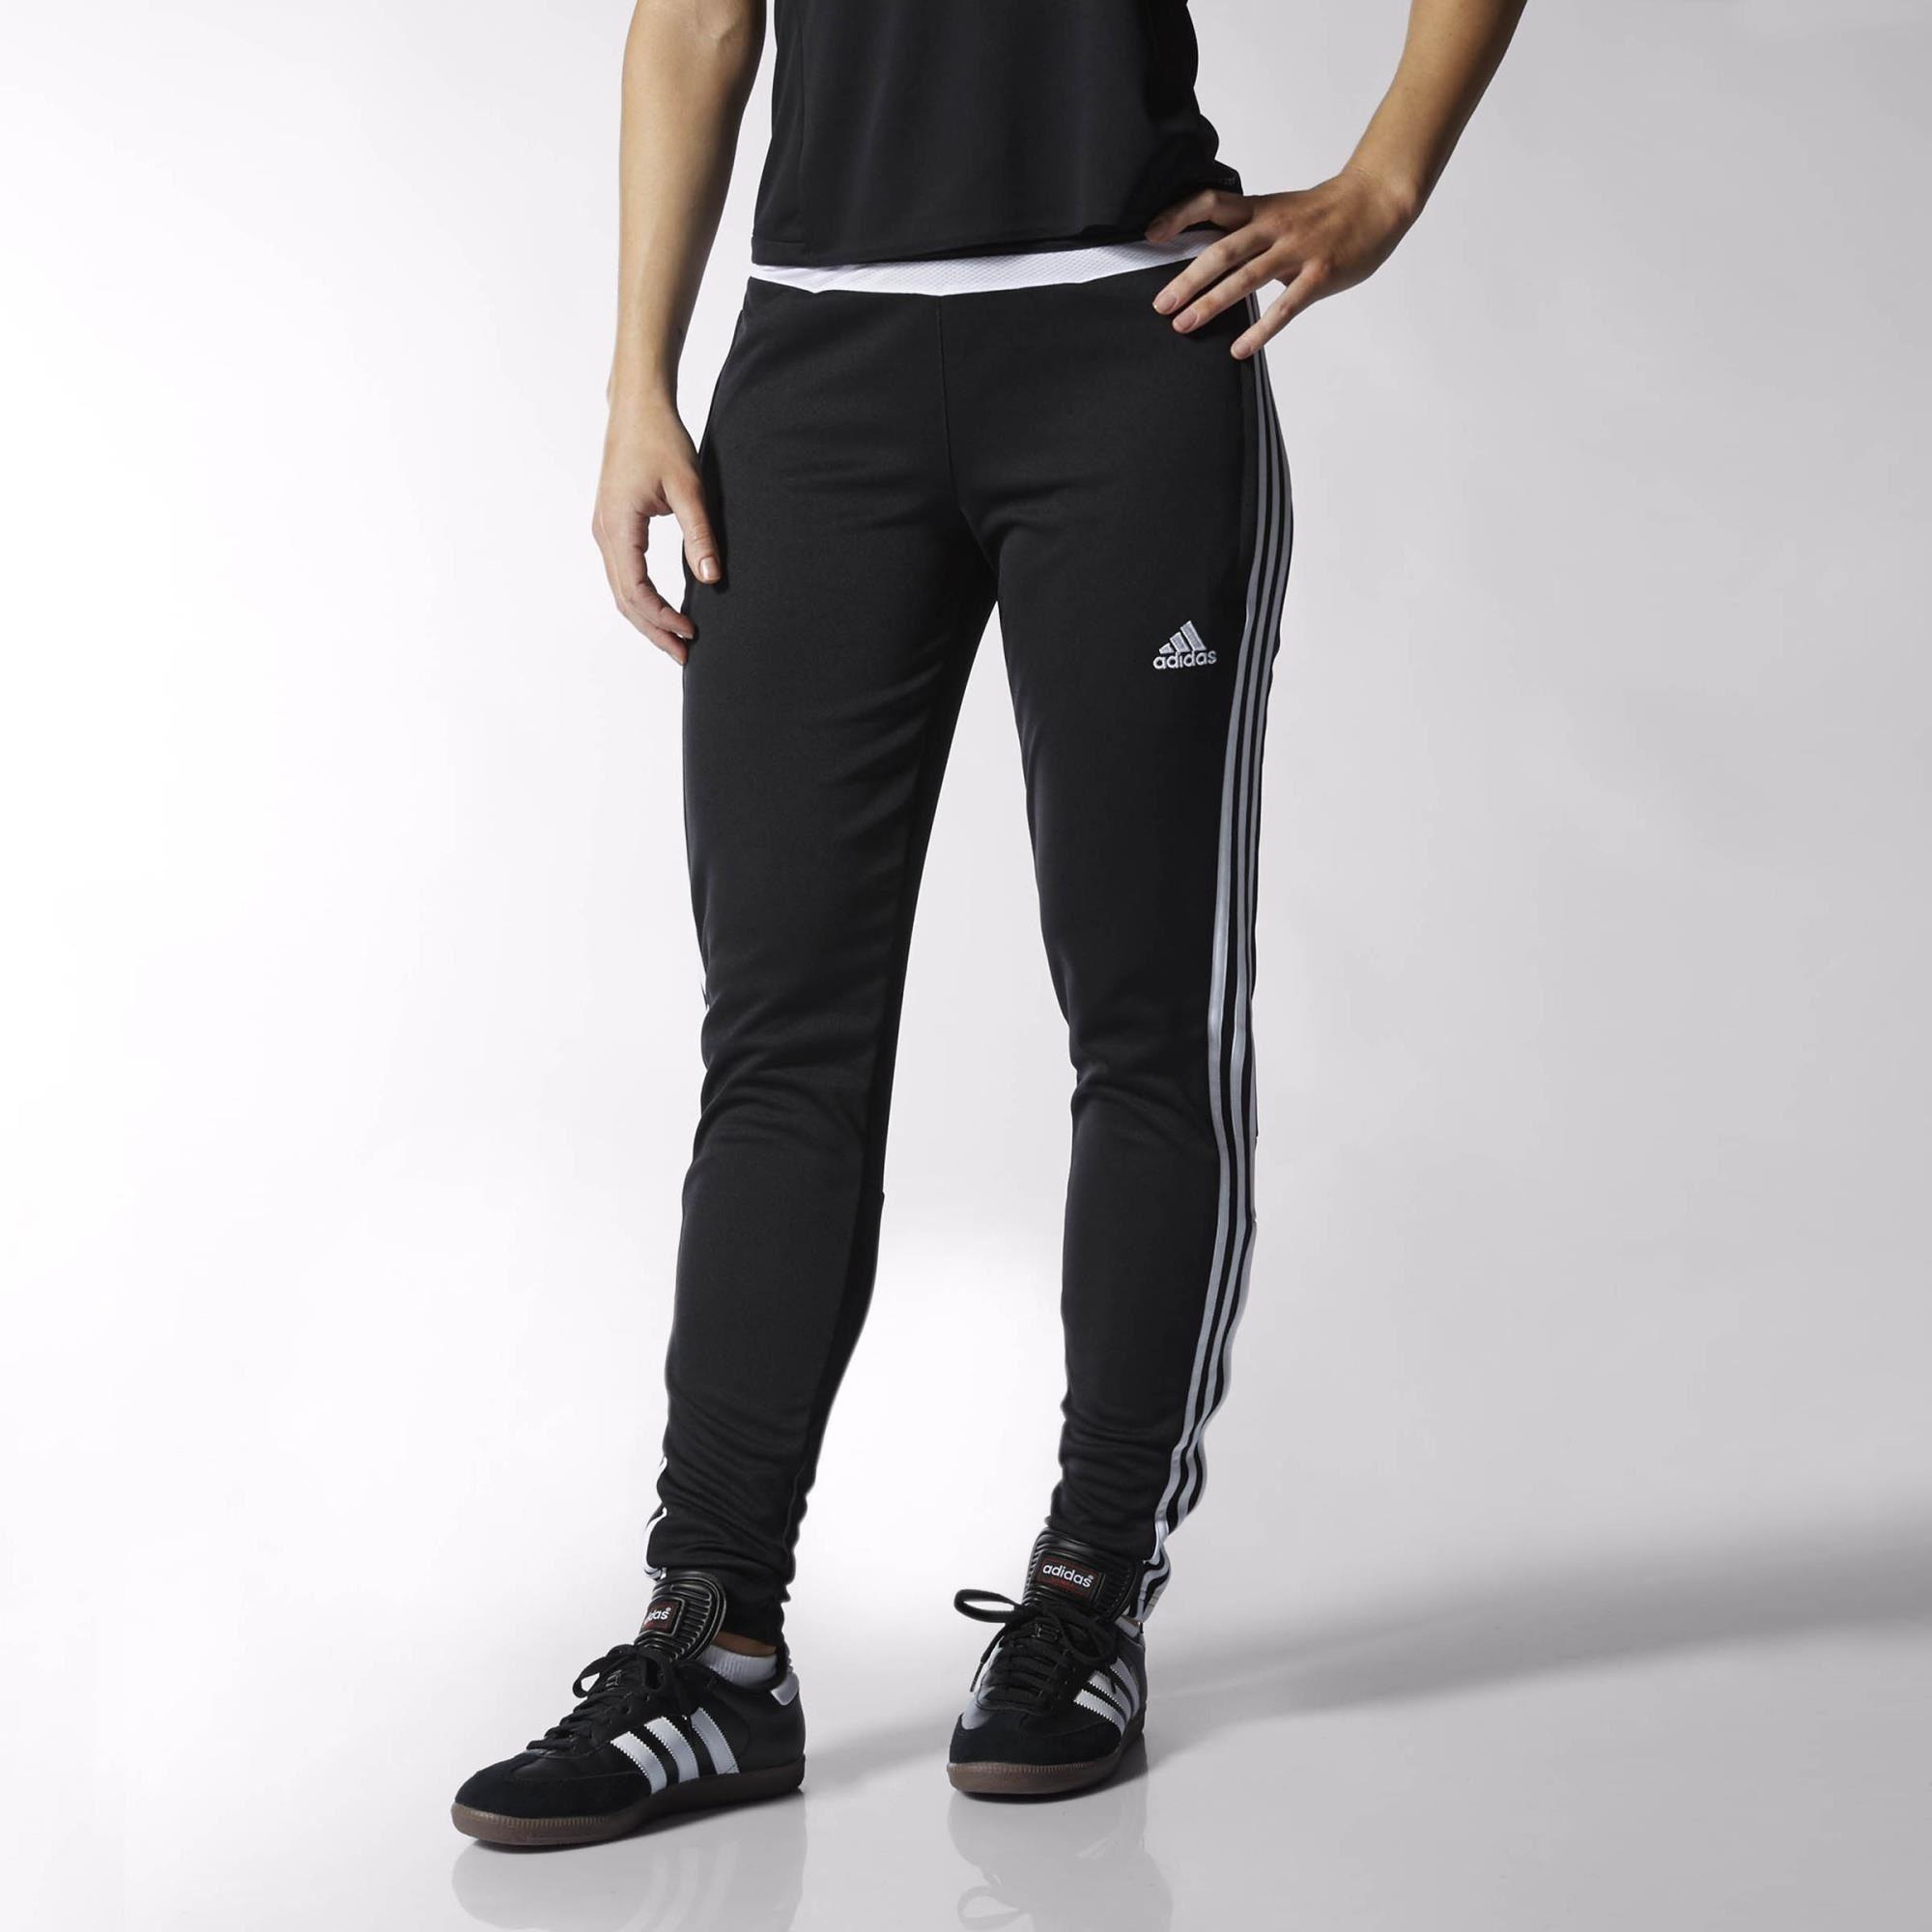 adidas Tiro 15 Training Pants | Soccer pants, Athletic